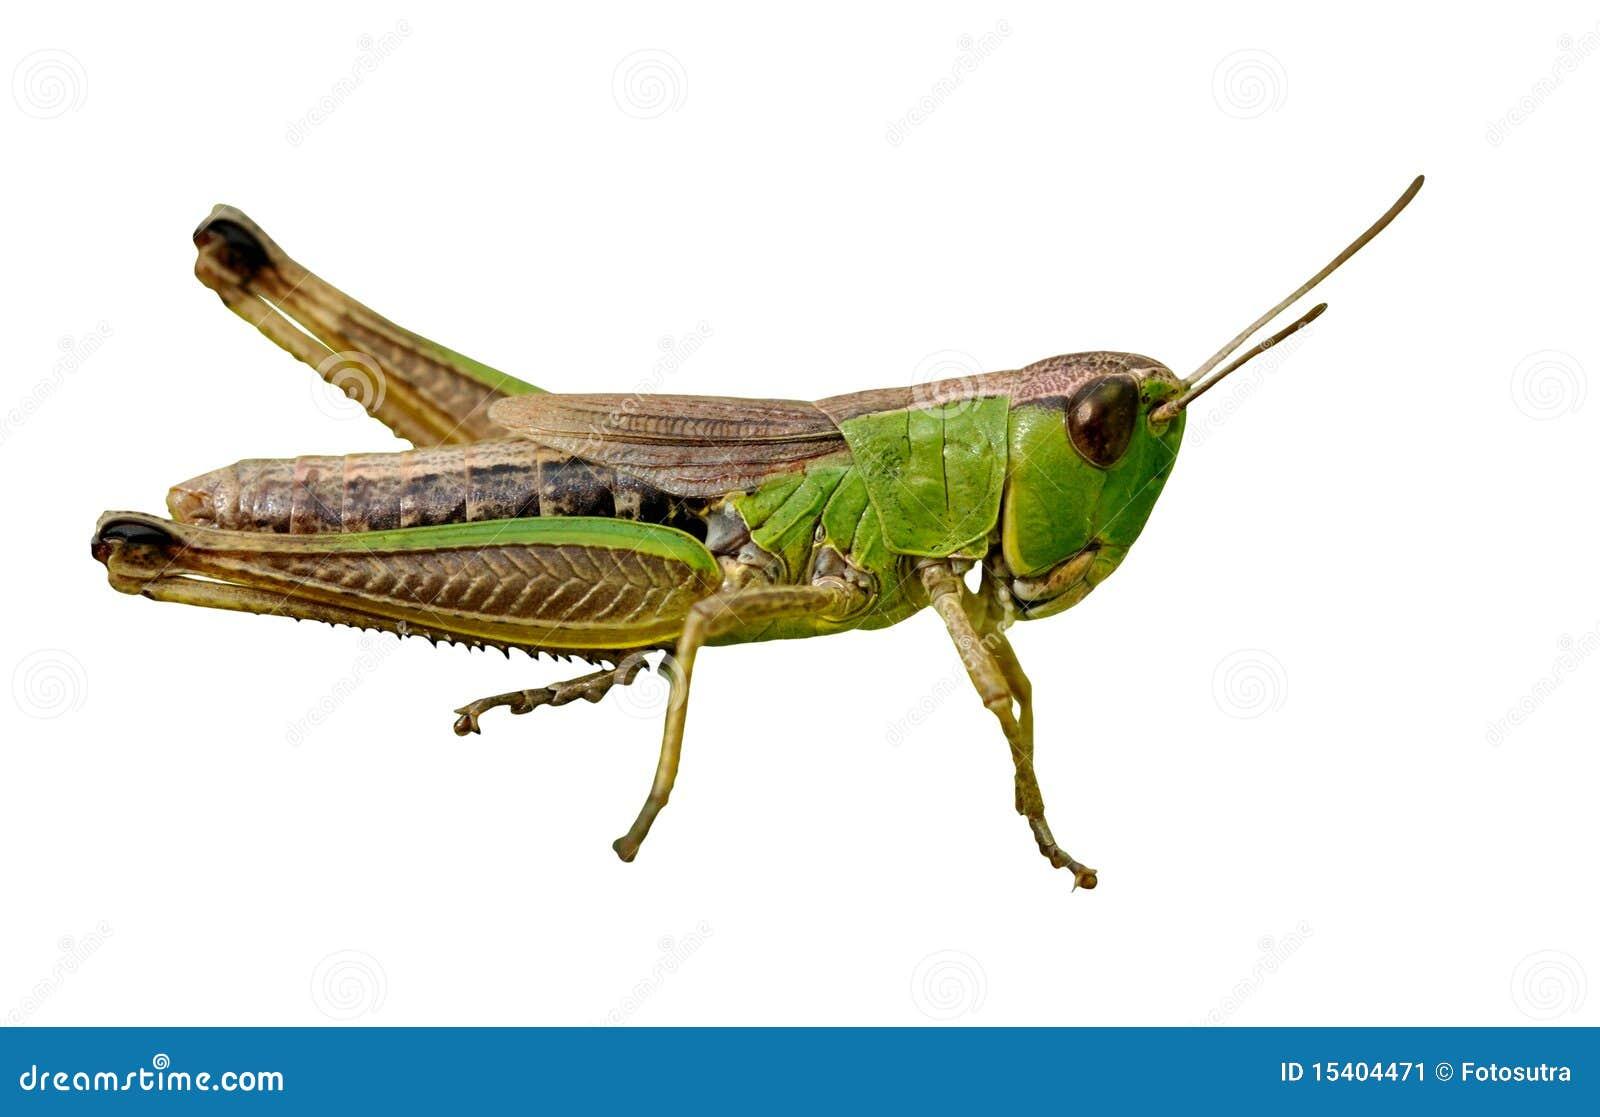 Isolated green grasshopper closeup